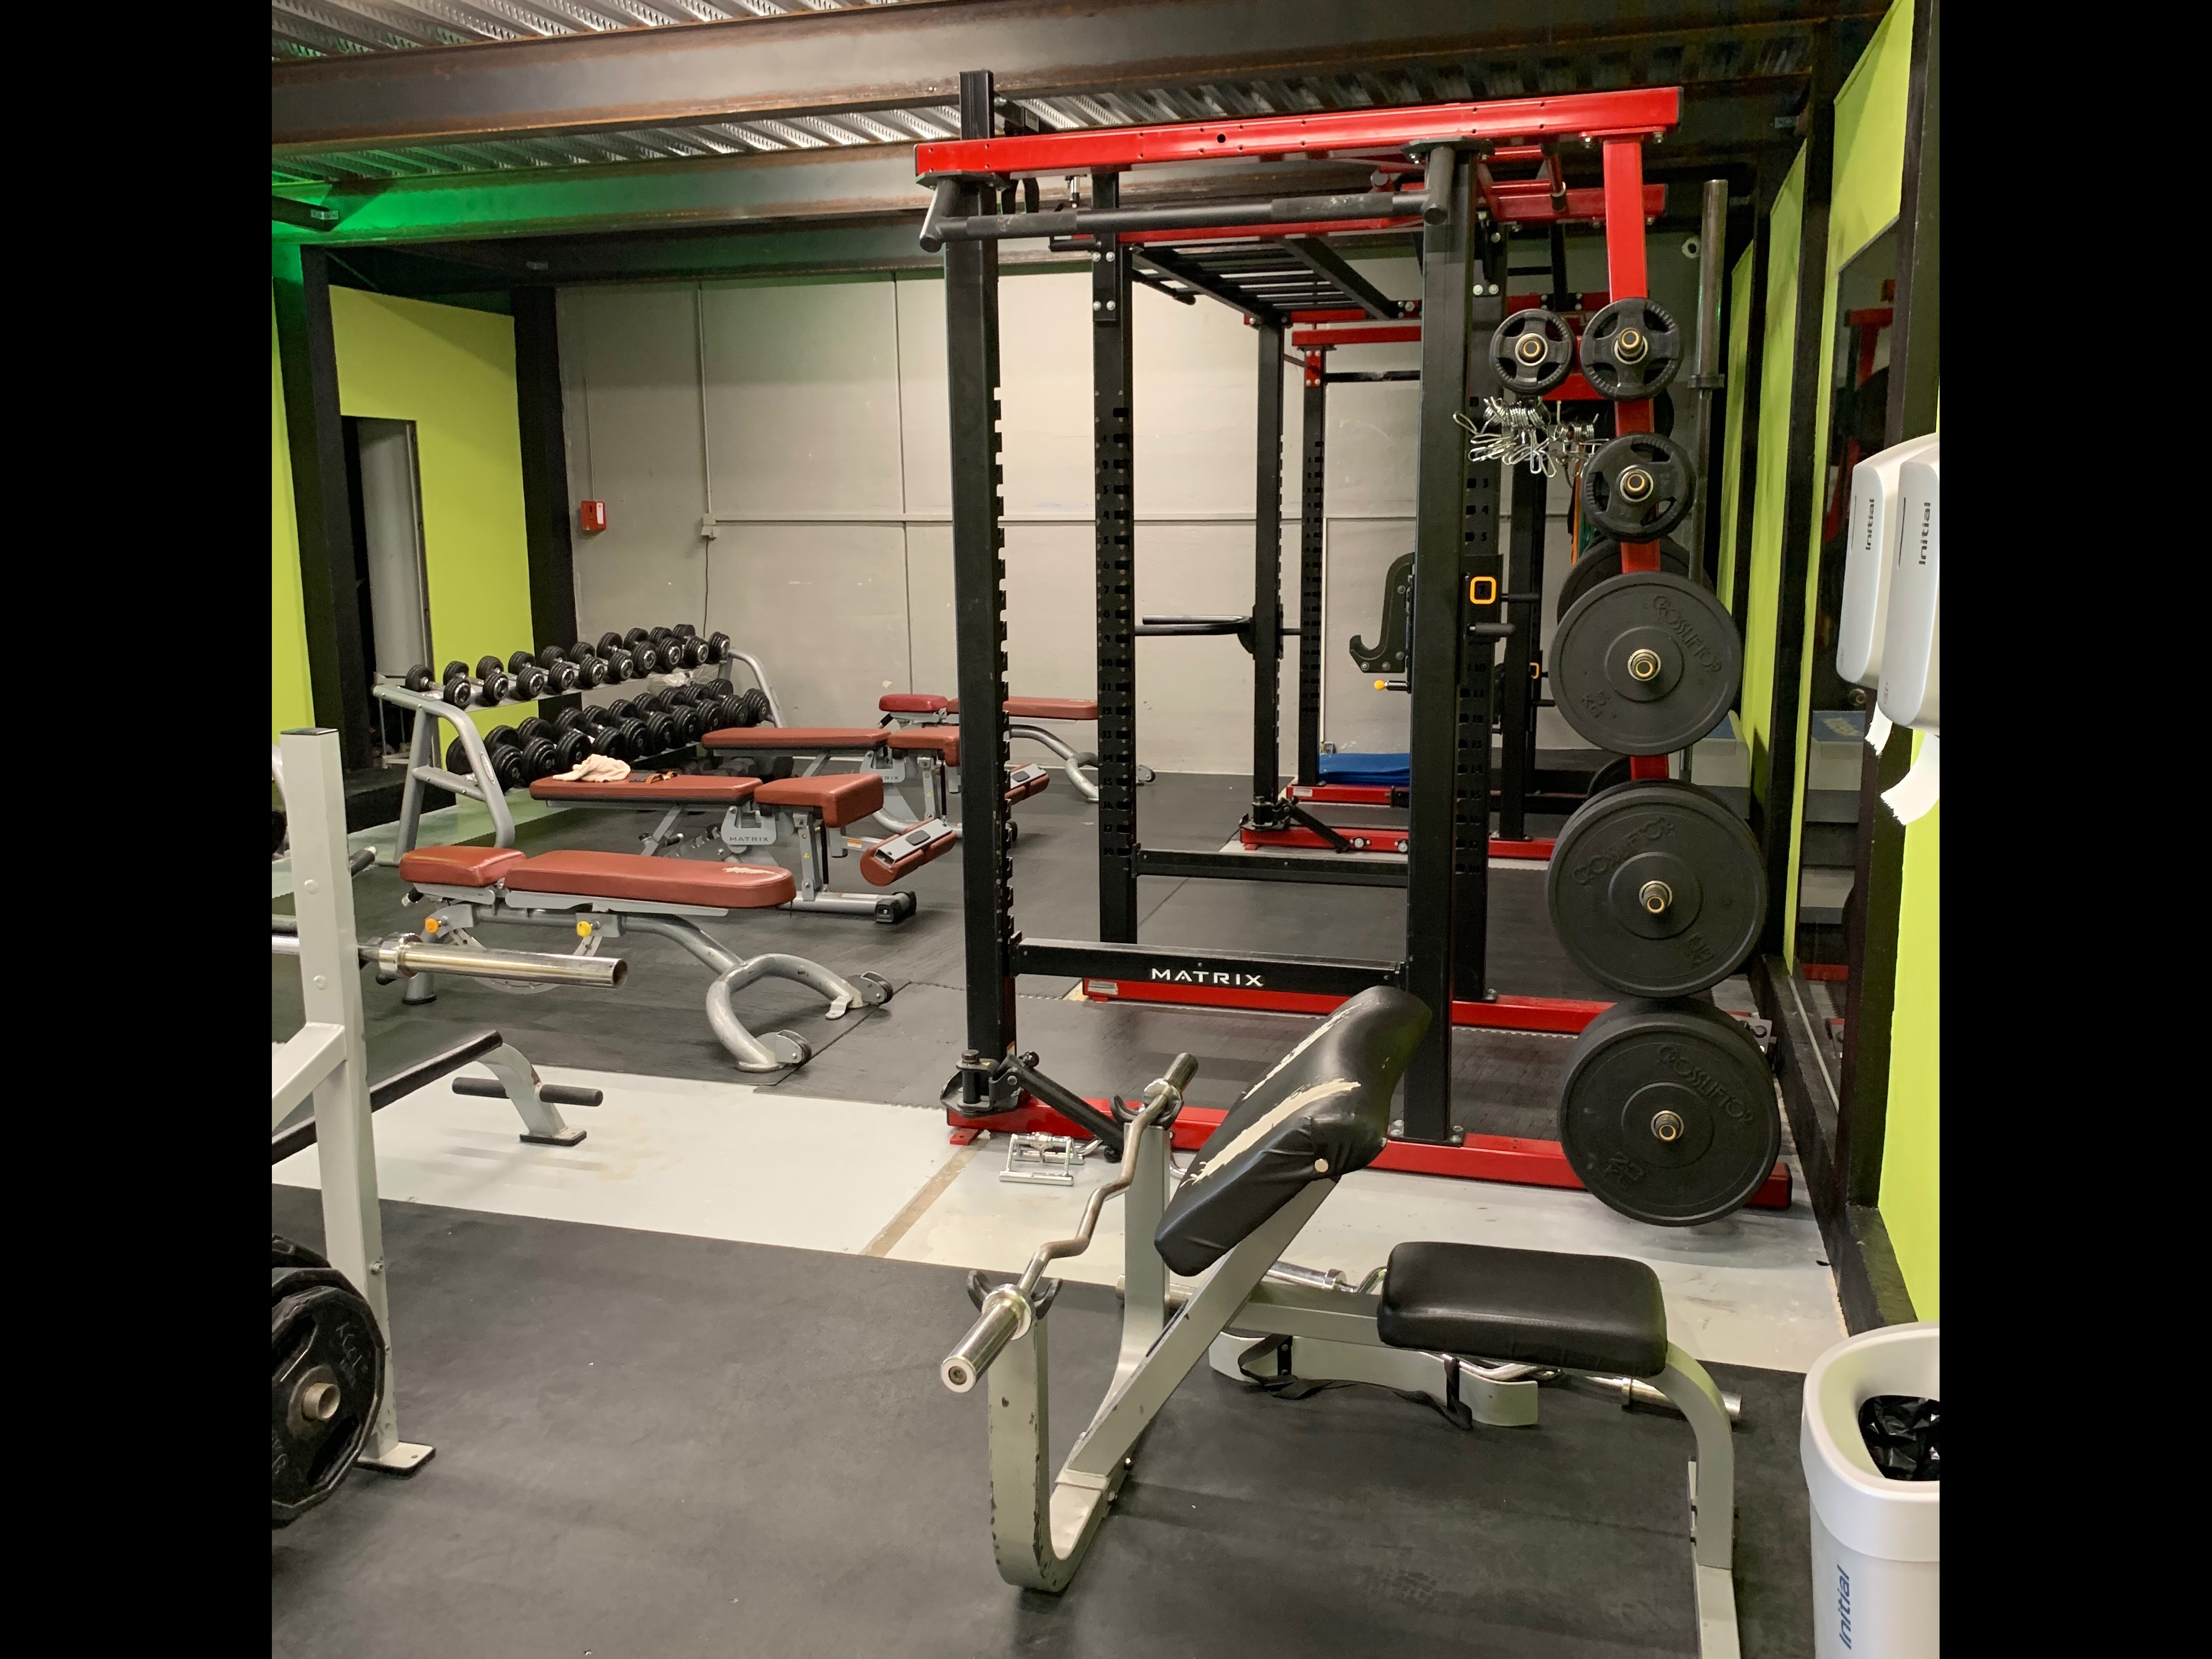 L Atelier Fitness Club Antony Tarifs Avis Horaires Essai Gratuit